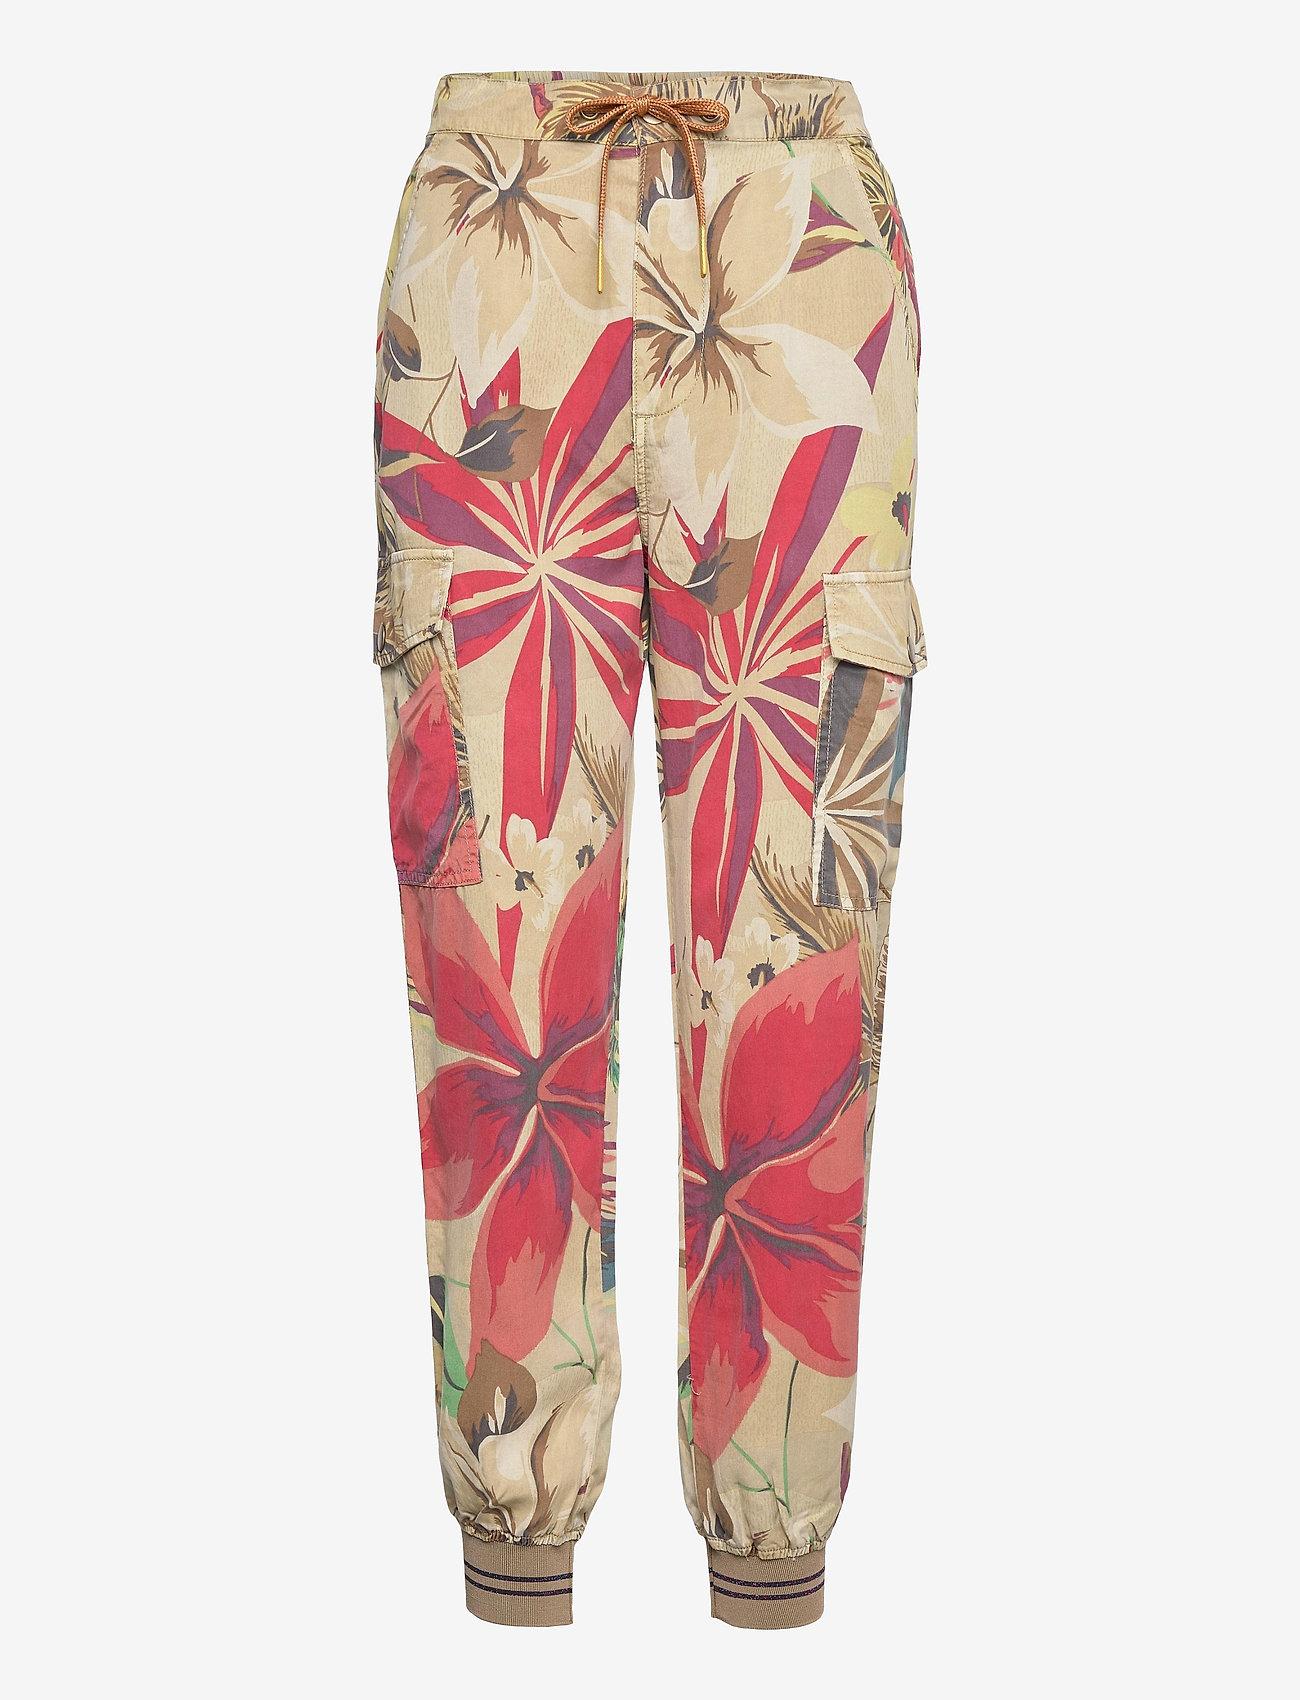 Desigual - PANT TOUCHE - kläder - beige safari - 0